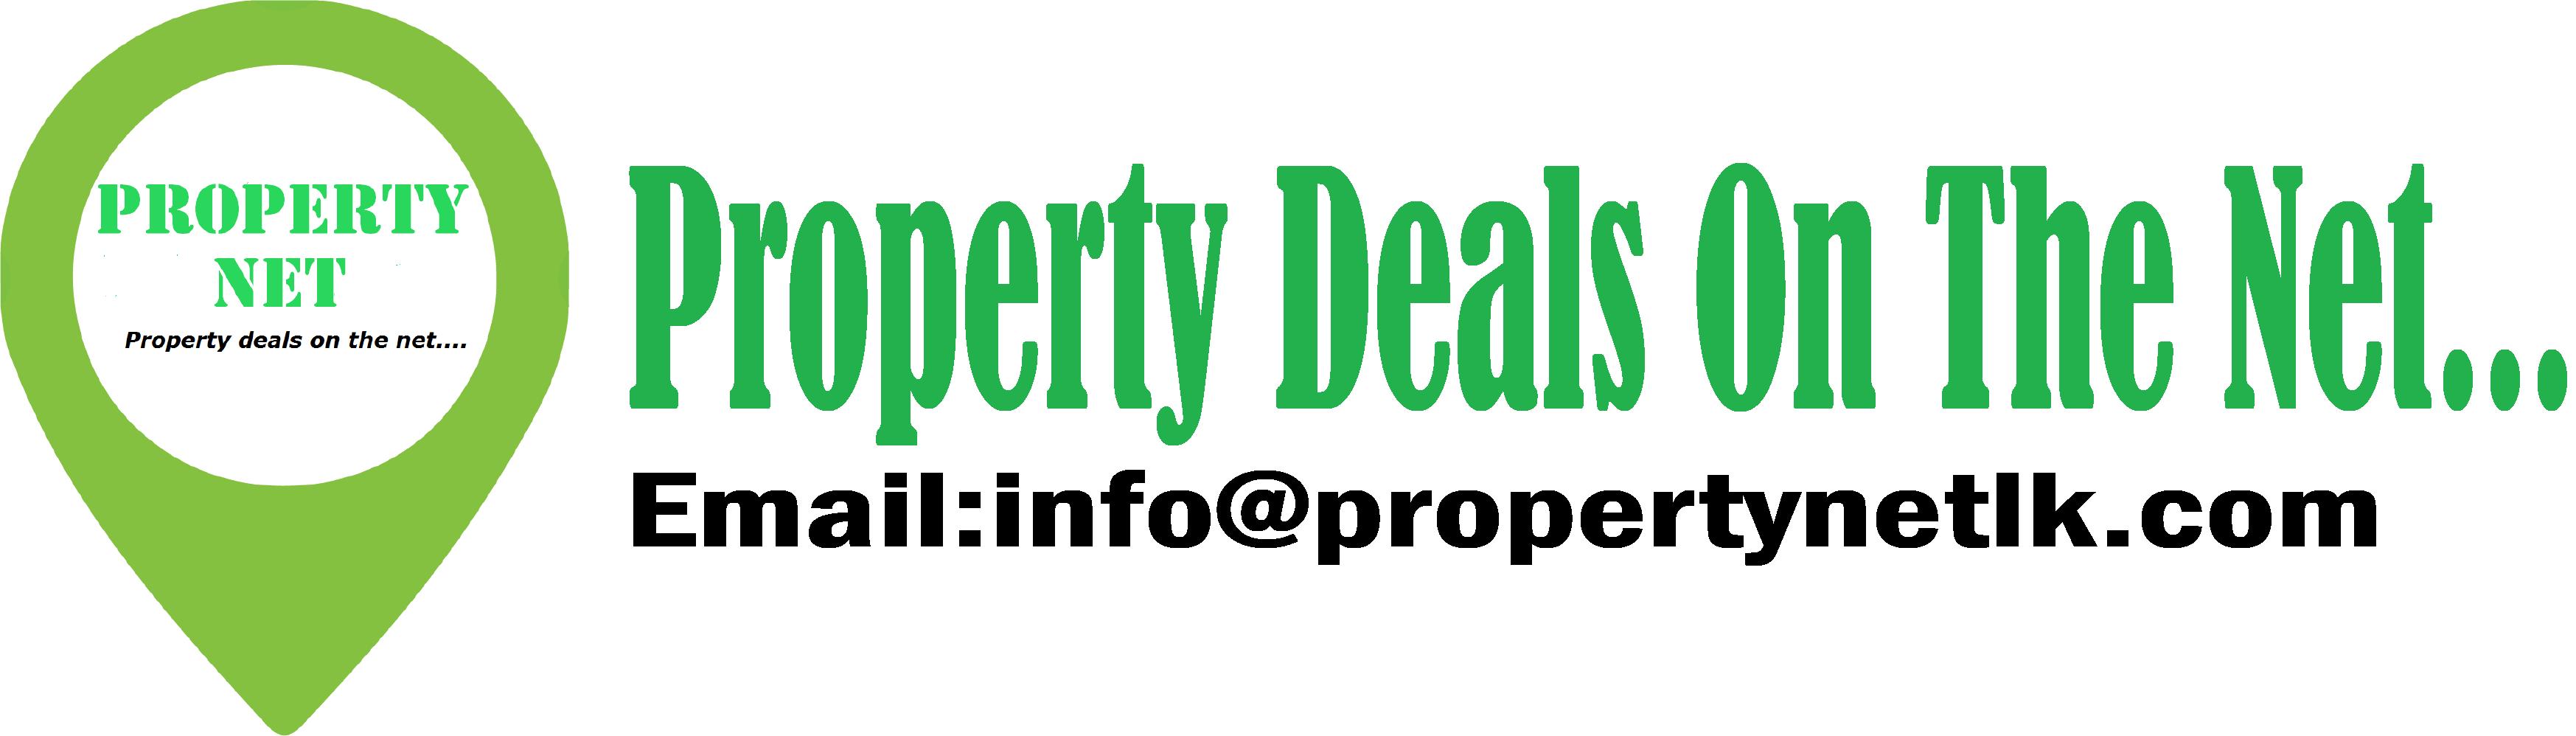 Propertynetlk Logo